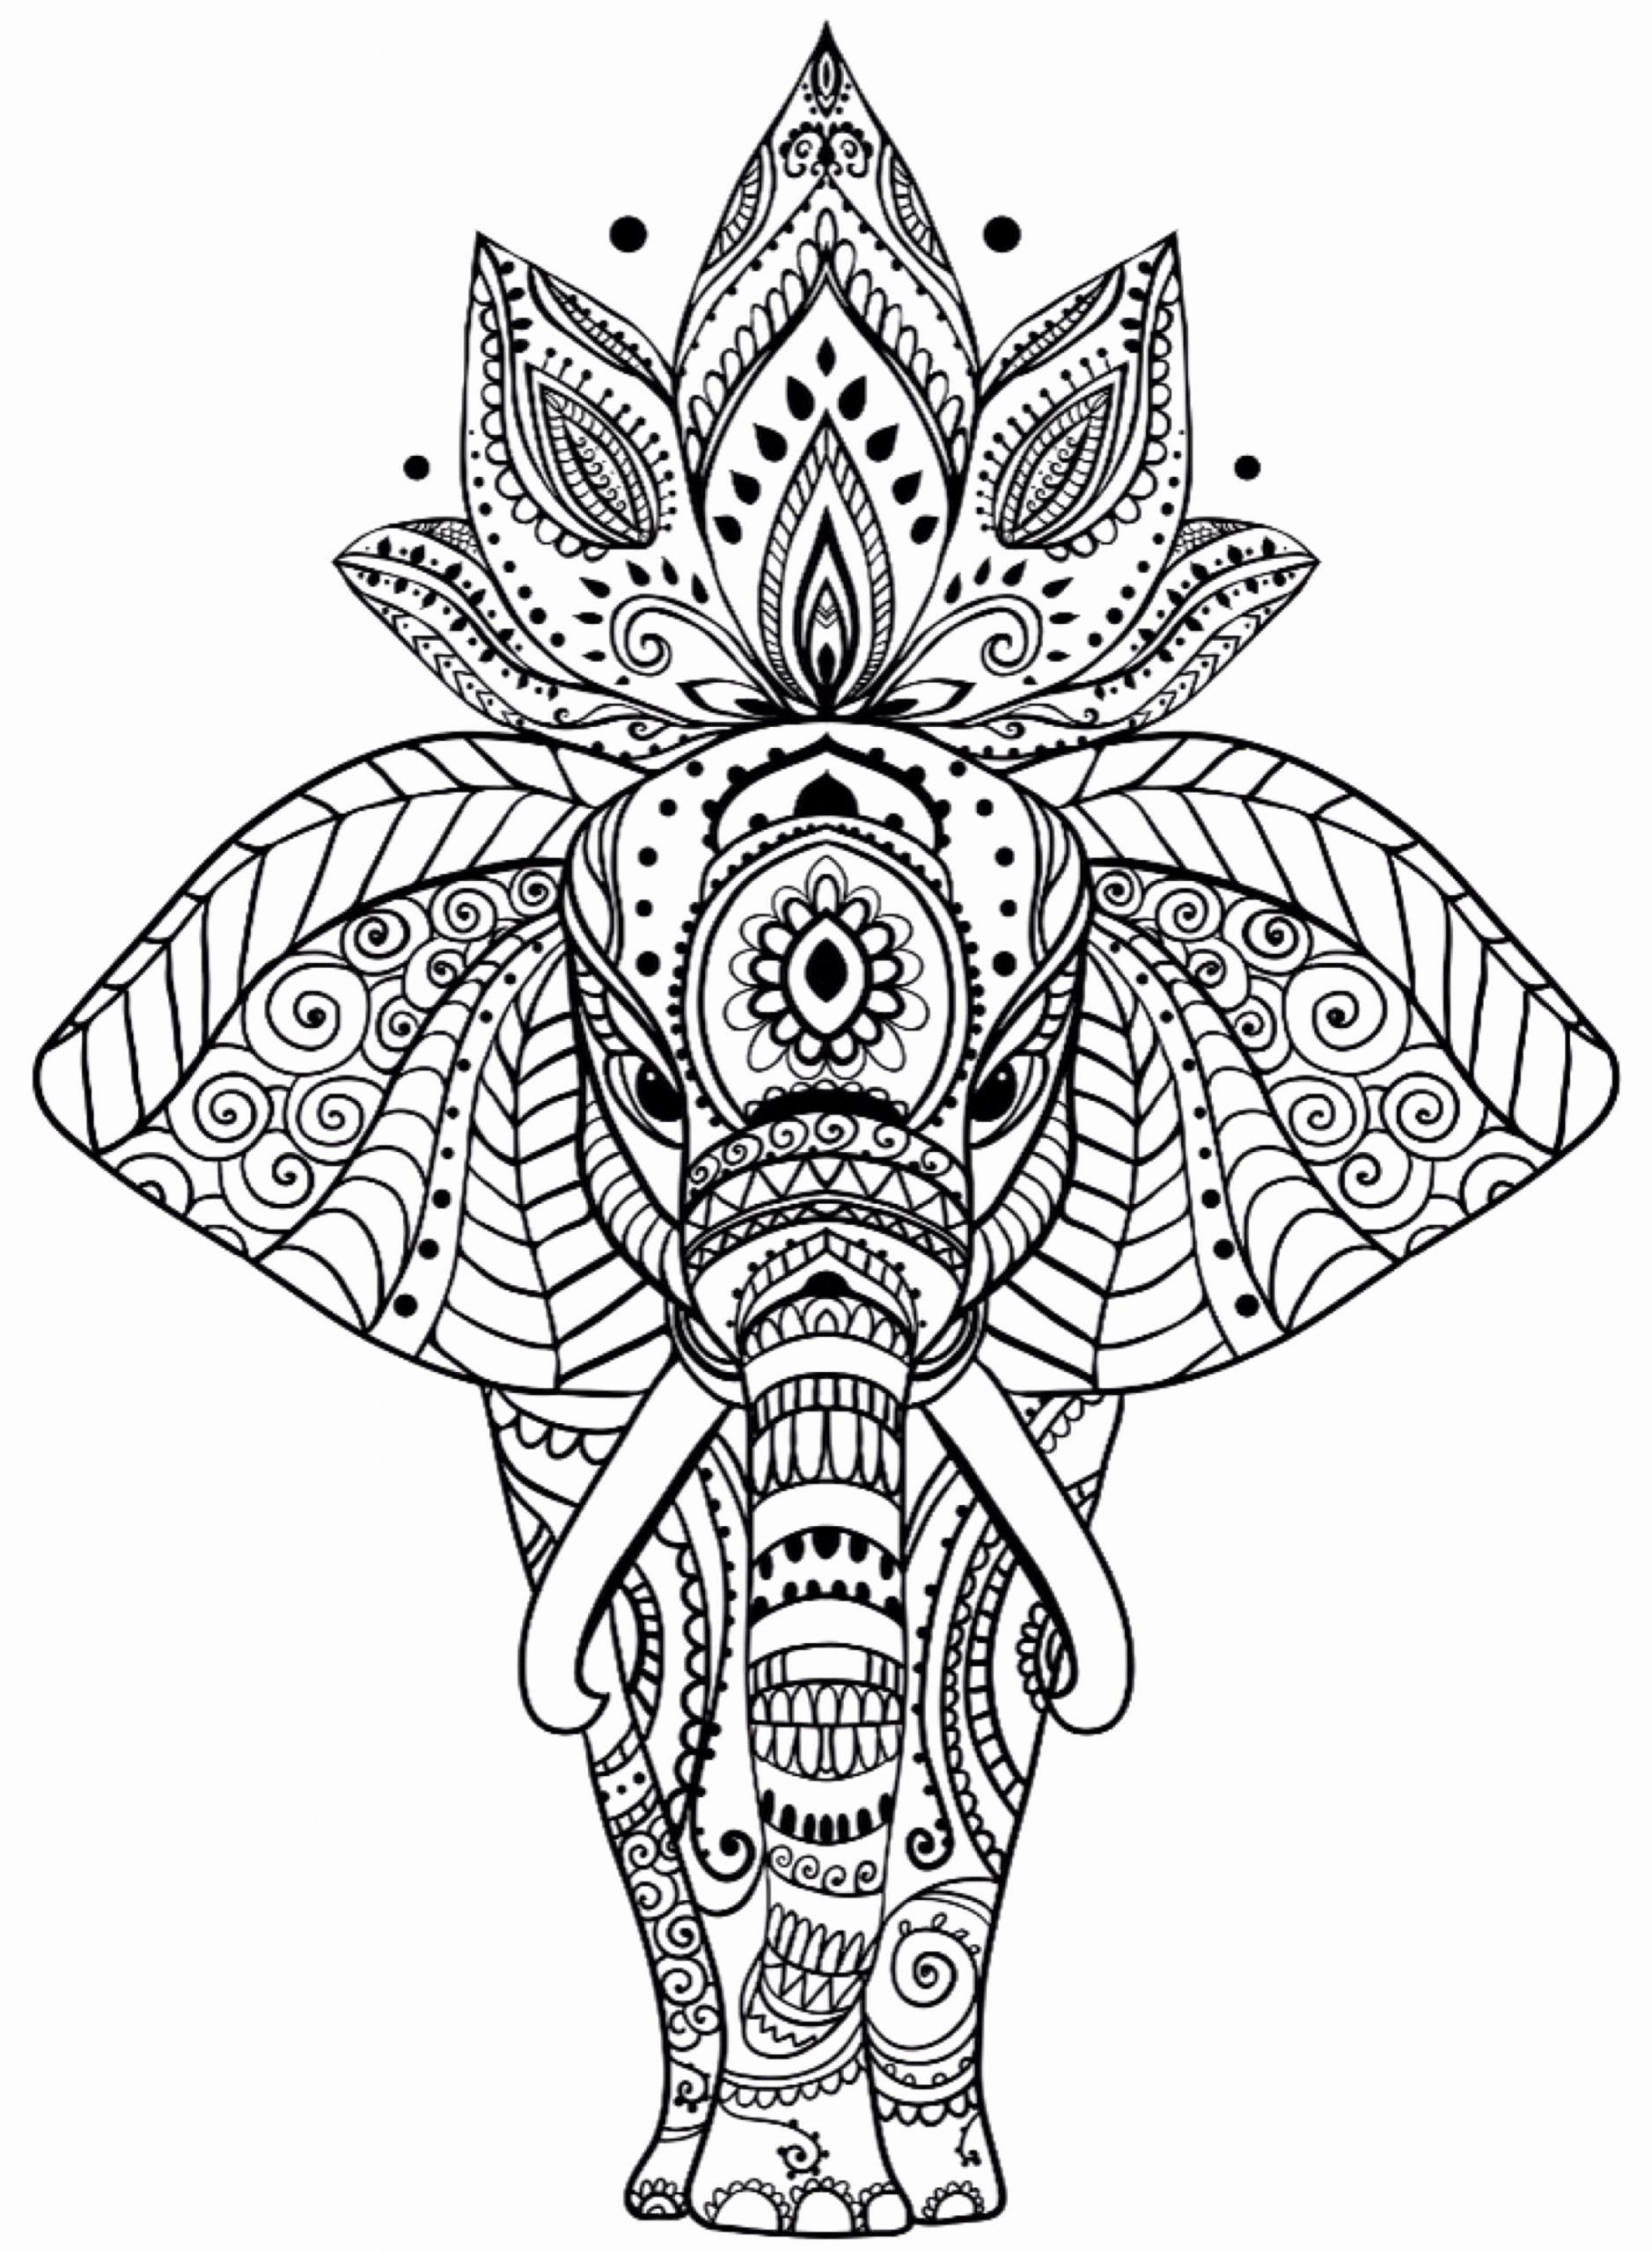 Animal Mandala Coloring Pages Fresh 22 Free Mandala Coloring Pages Pdf Collection Coloring Elephant Coloring Page Mandala Coloring Pages Mandala Coloring